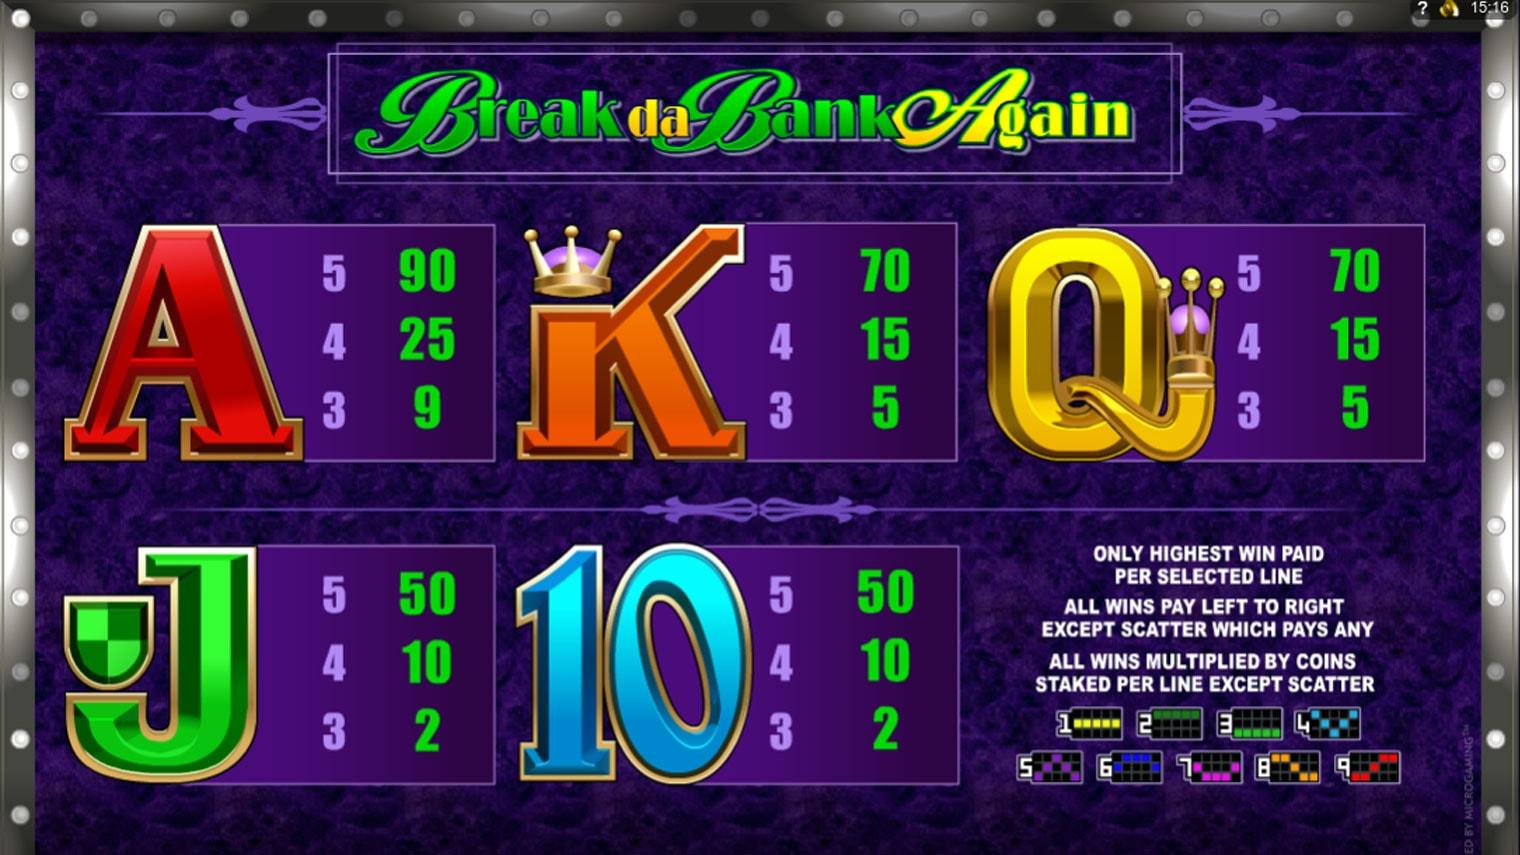 Break da Bank Again Slot Game Symbols and Winning Combinations